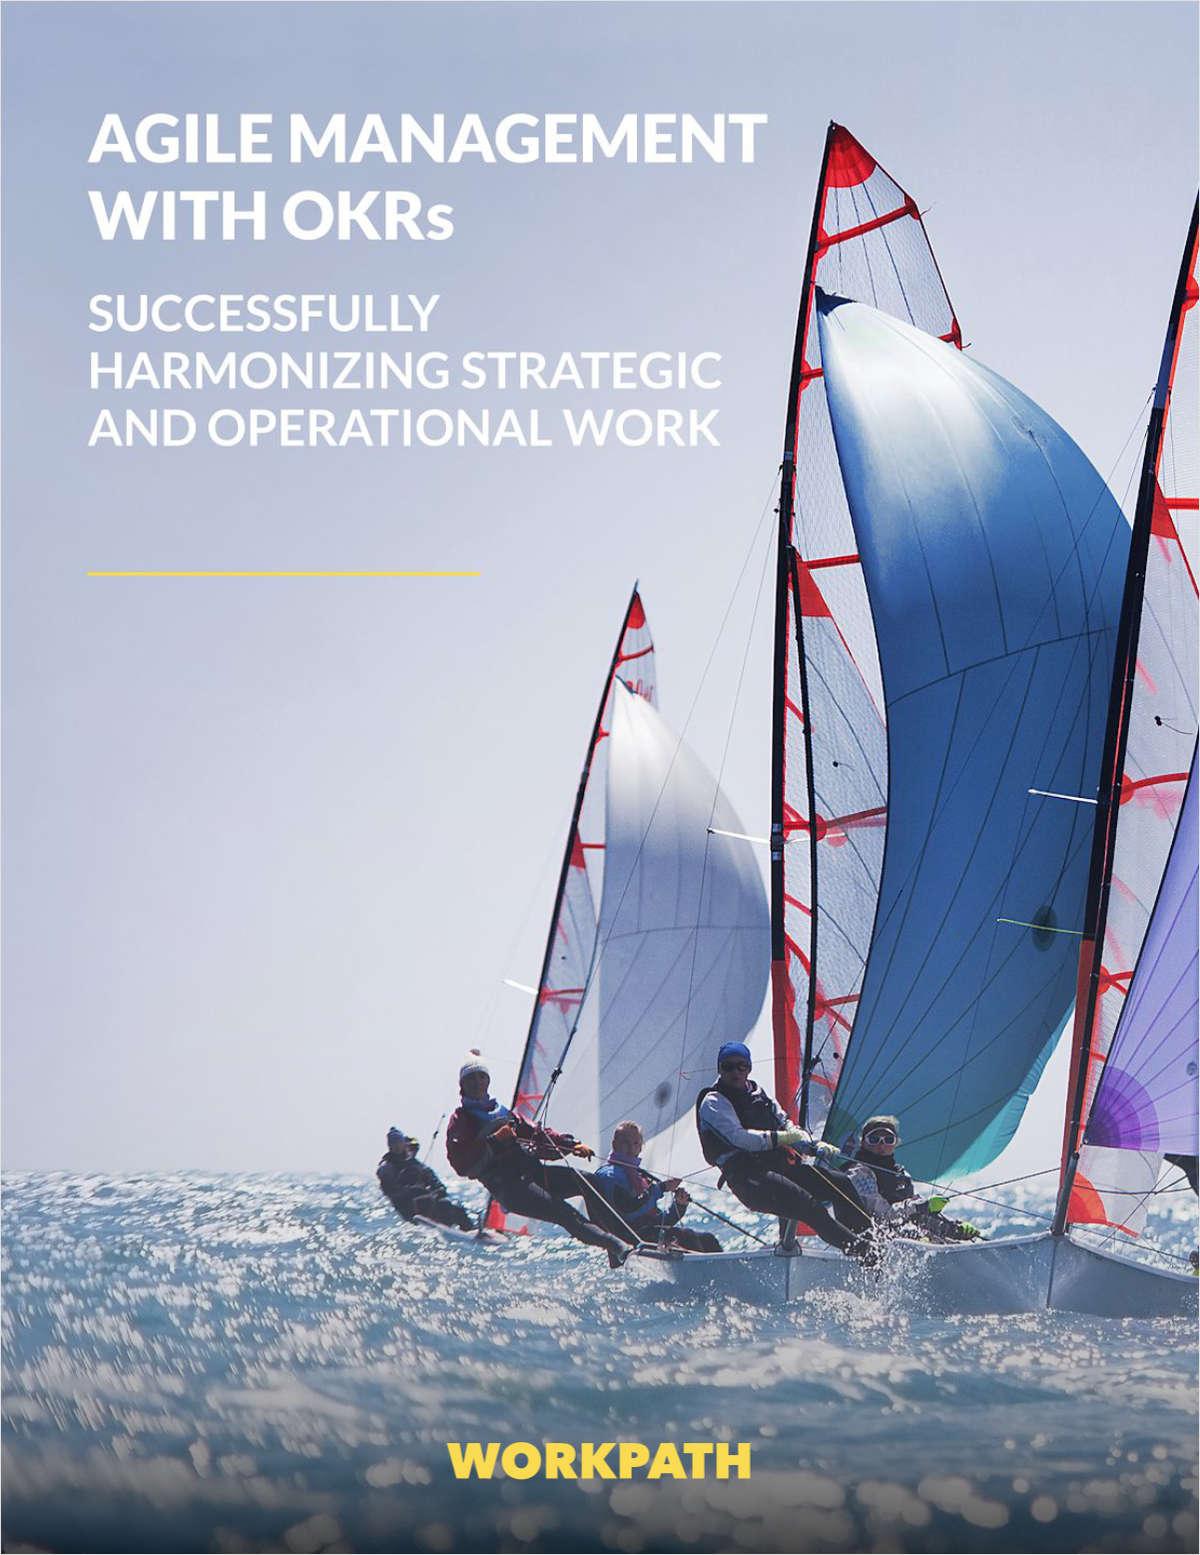 Agile Management with OKRs - Successfully harmonizing strategic and operational work